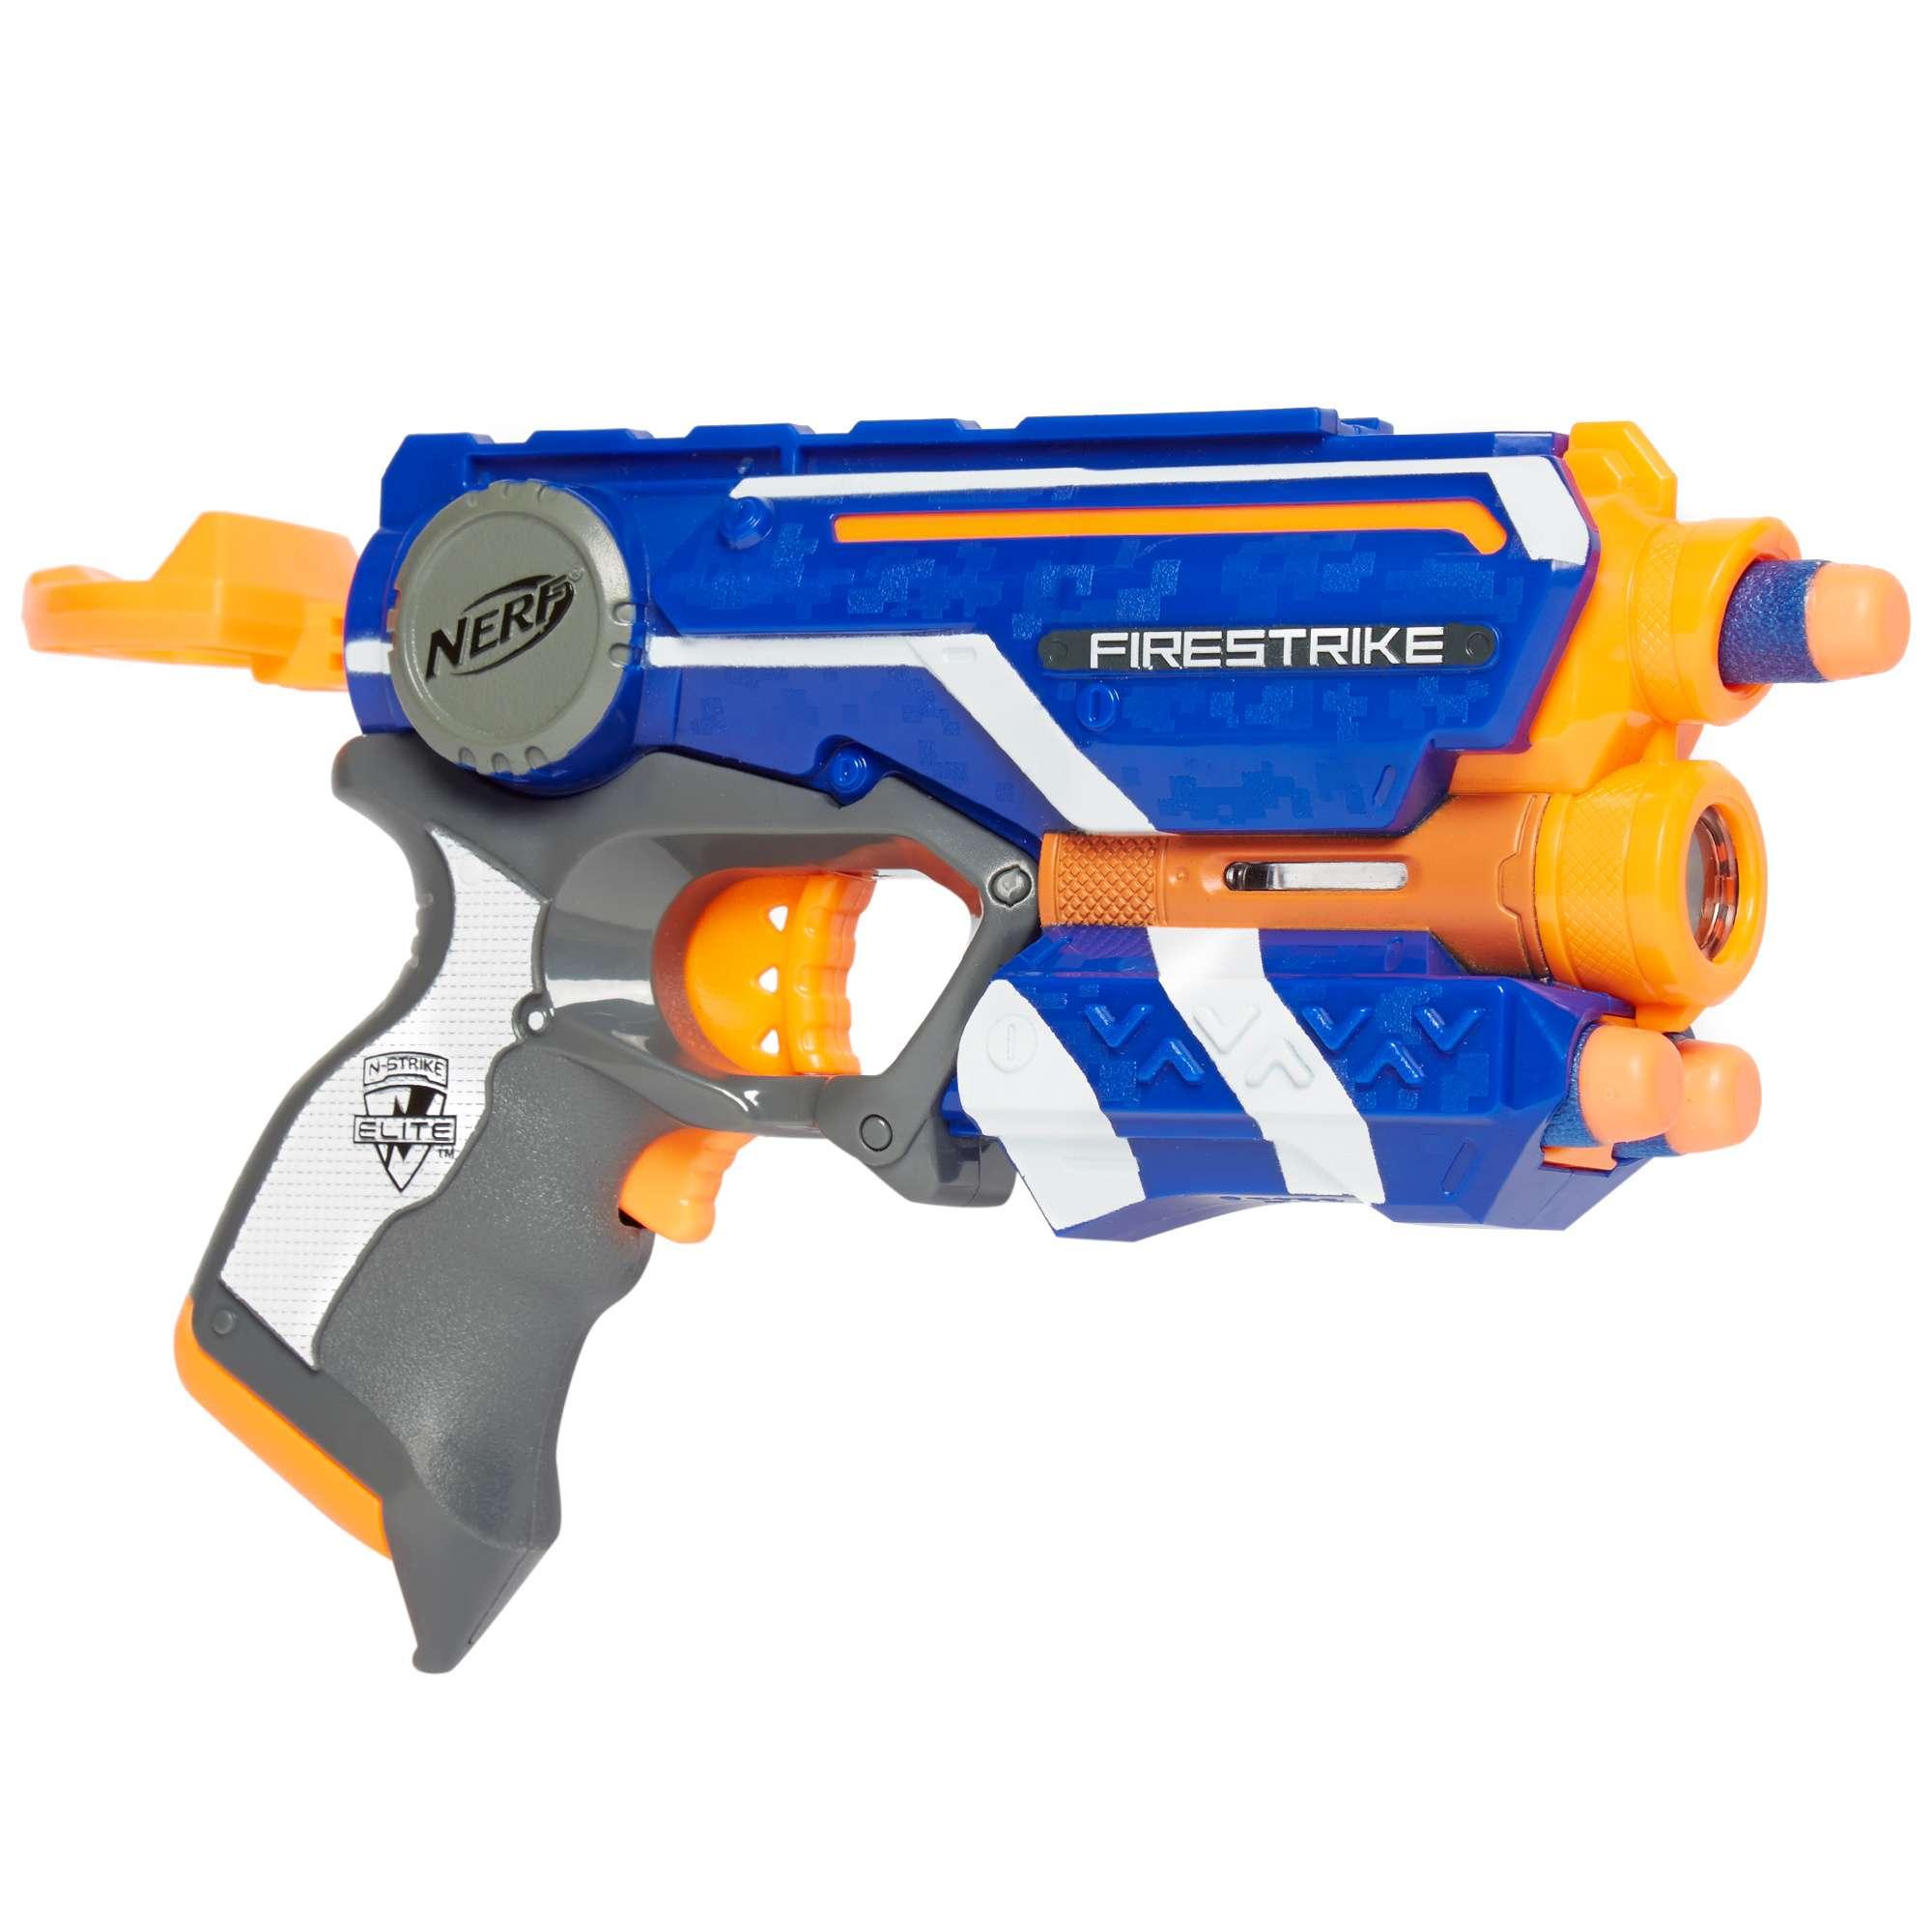 NERF N-Strike Firestrike Blaster